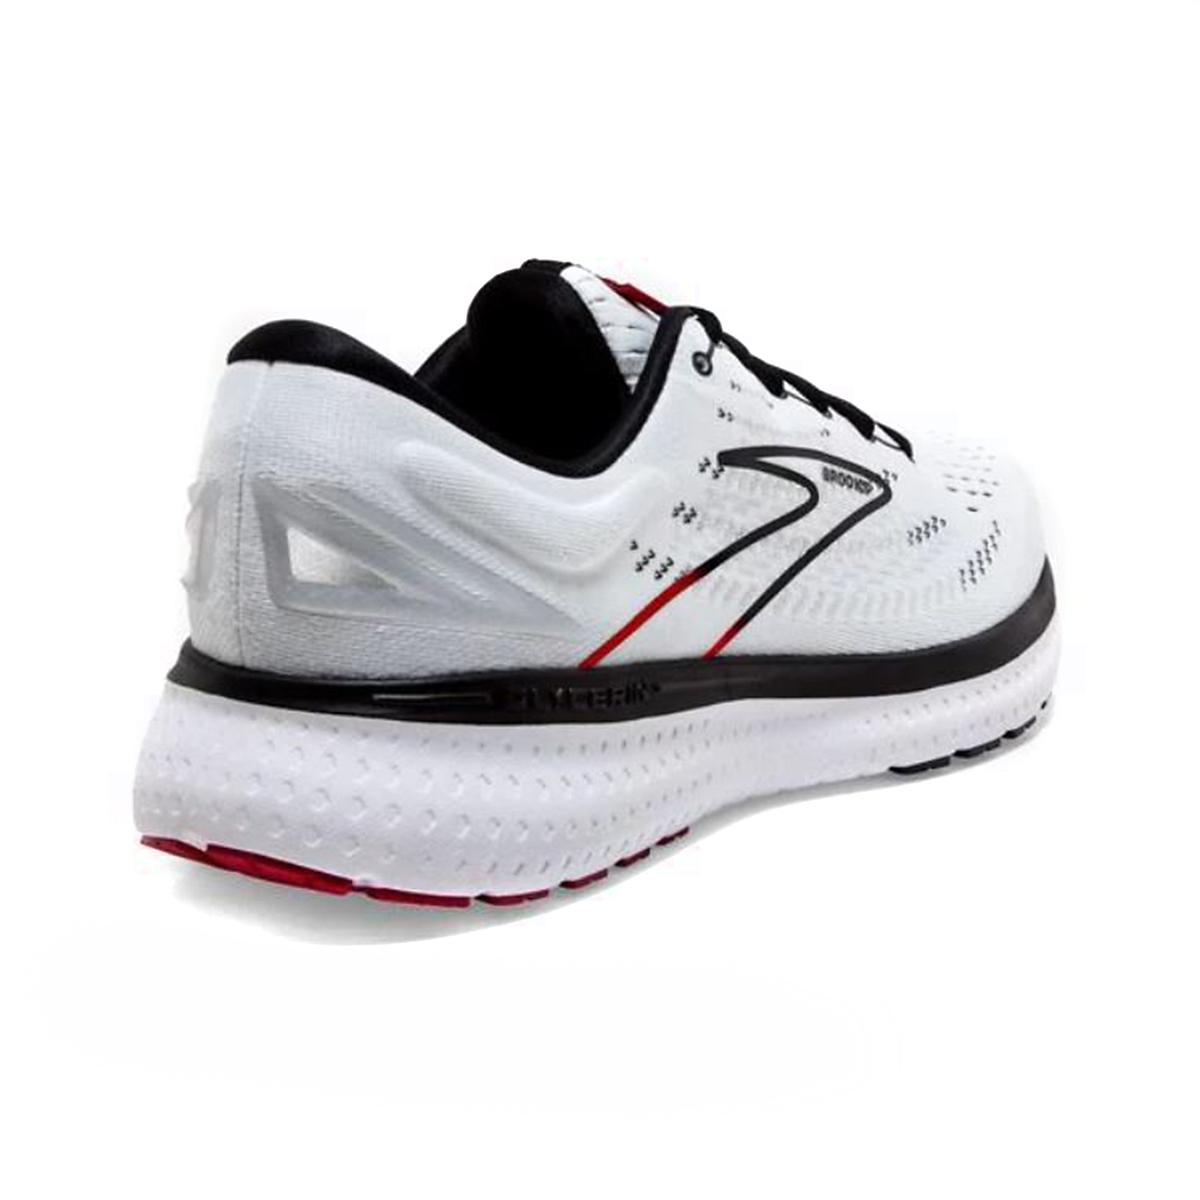 Men's Brooks Glycerin 19 Running Shoe - Color: White/Black/Red - Size: 7 - Width: Regular, White/Black/Red, large, image 4